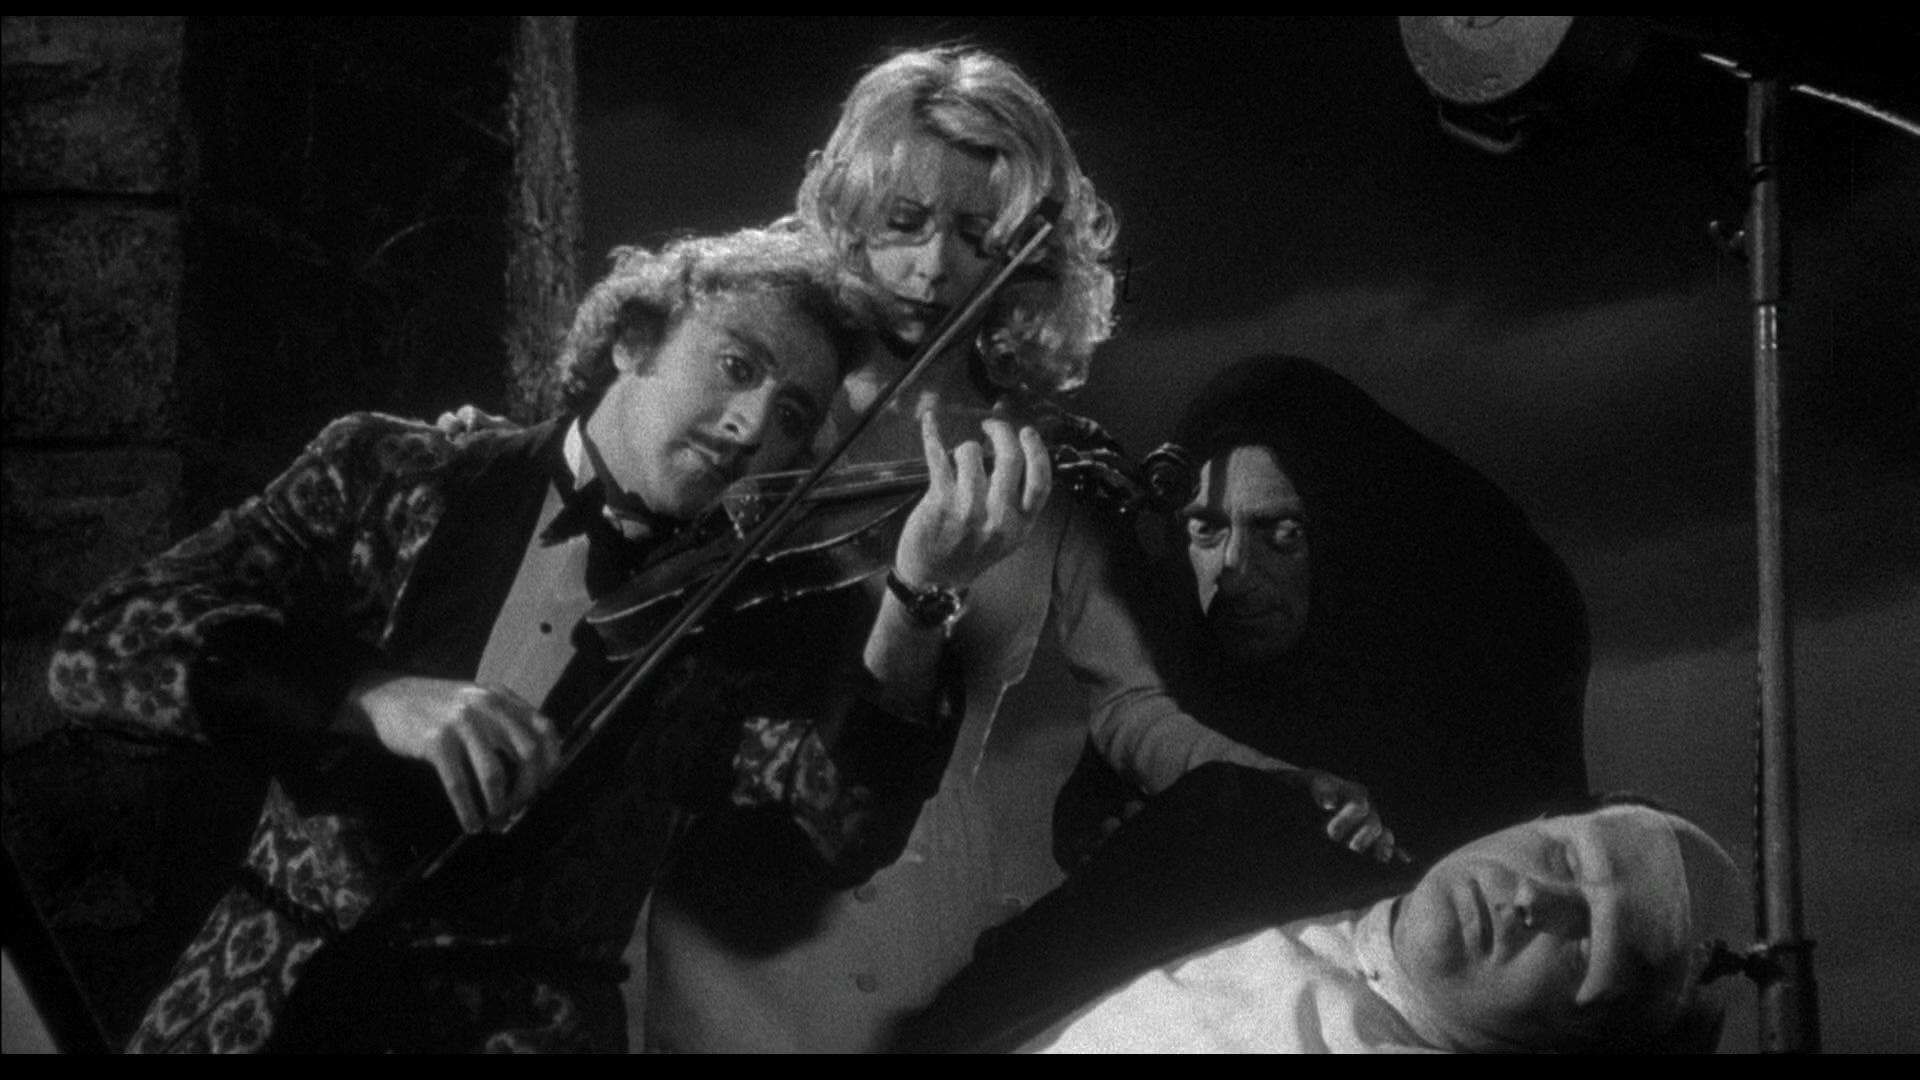 Gene Wilder Young Frankenstein Wallpaper See young frankenstein 1920x1080